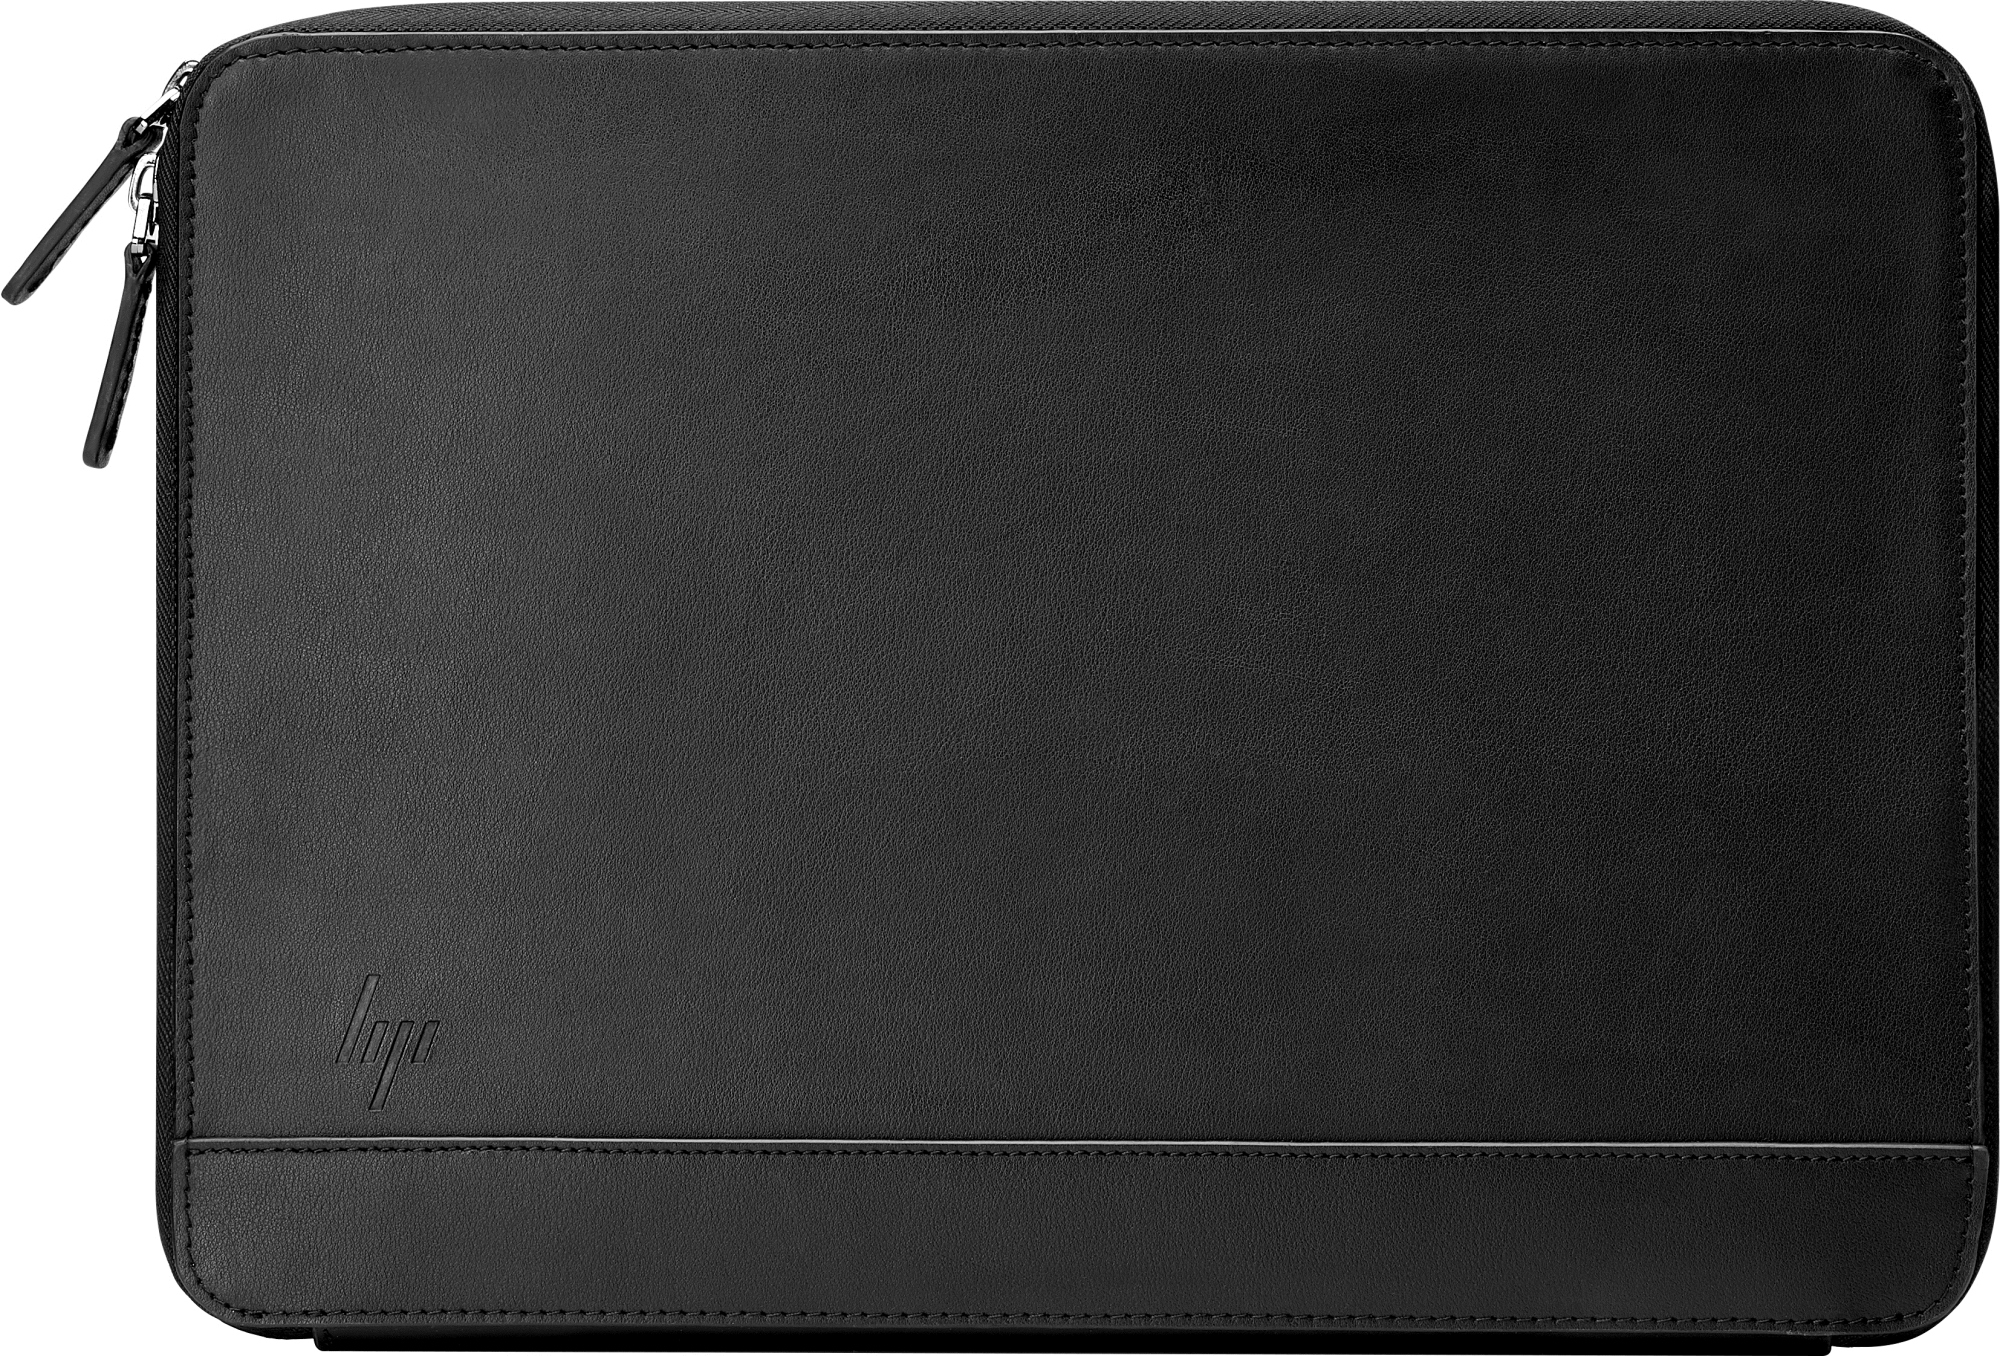 Elite Notebook Portfolio Maletines Para Portátil 35,6 Cm (14) Funda Negro